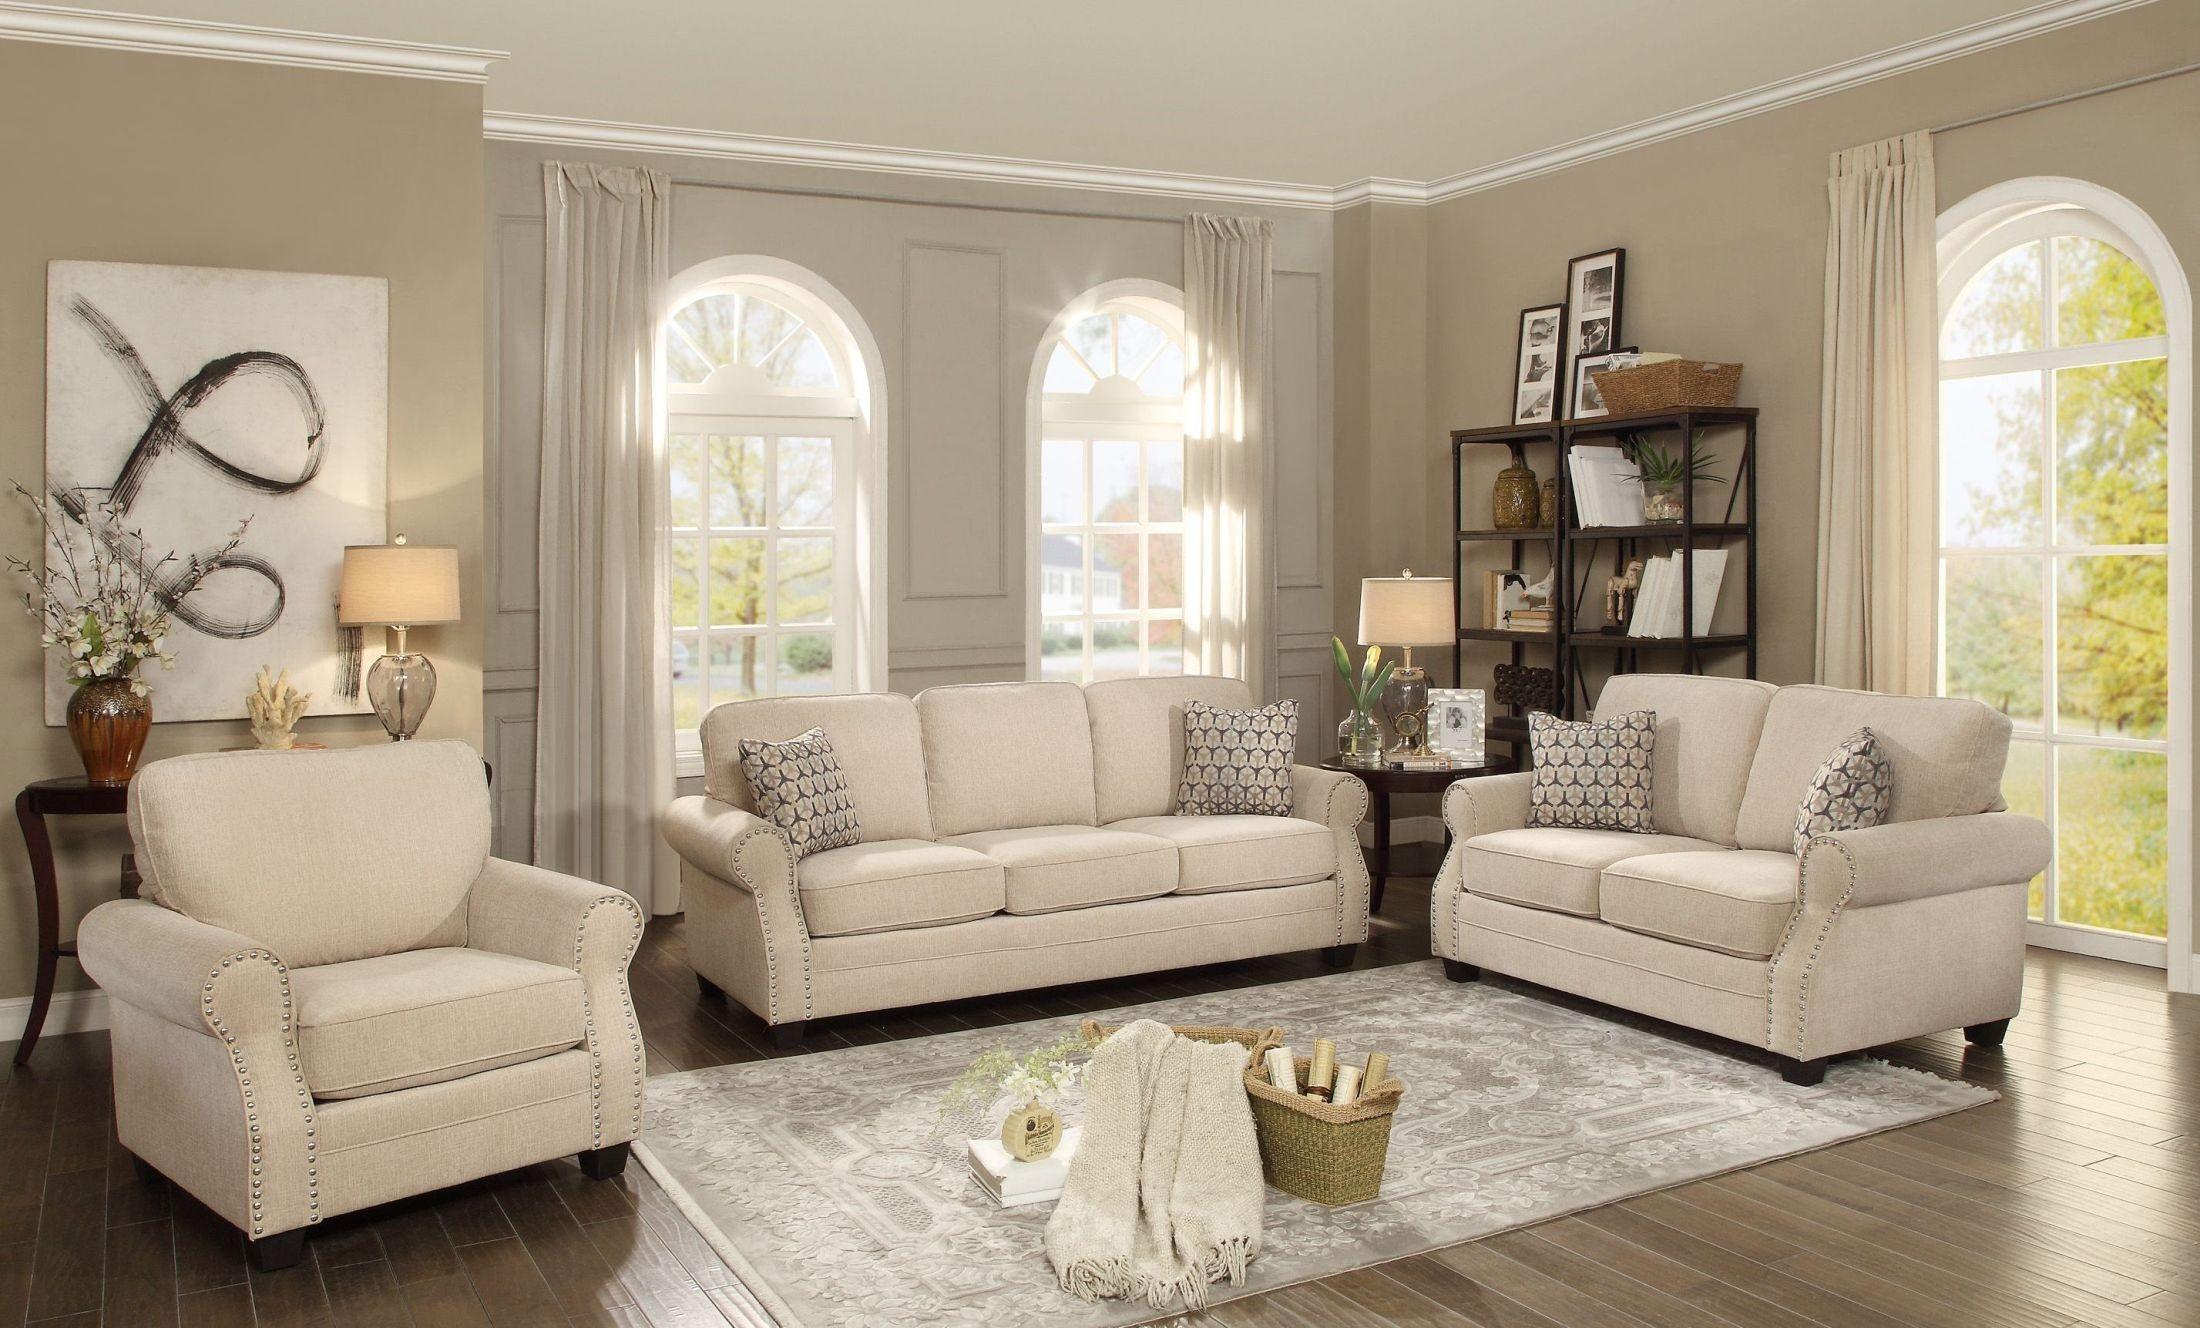 Rooms: Bechette Natural Tone Living Room Set From Homelegance